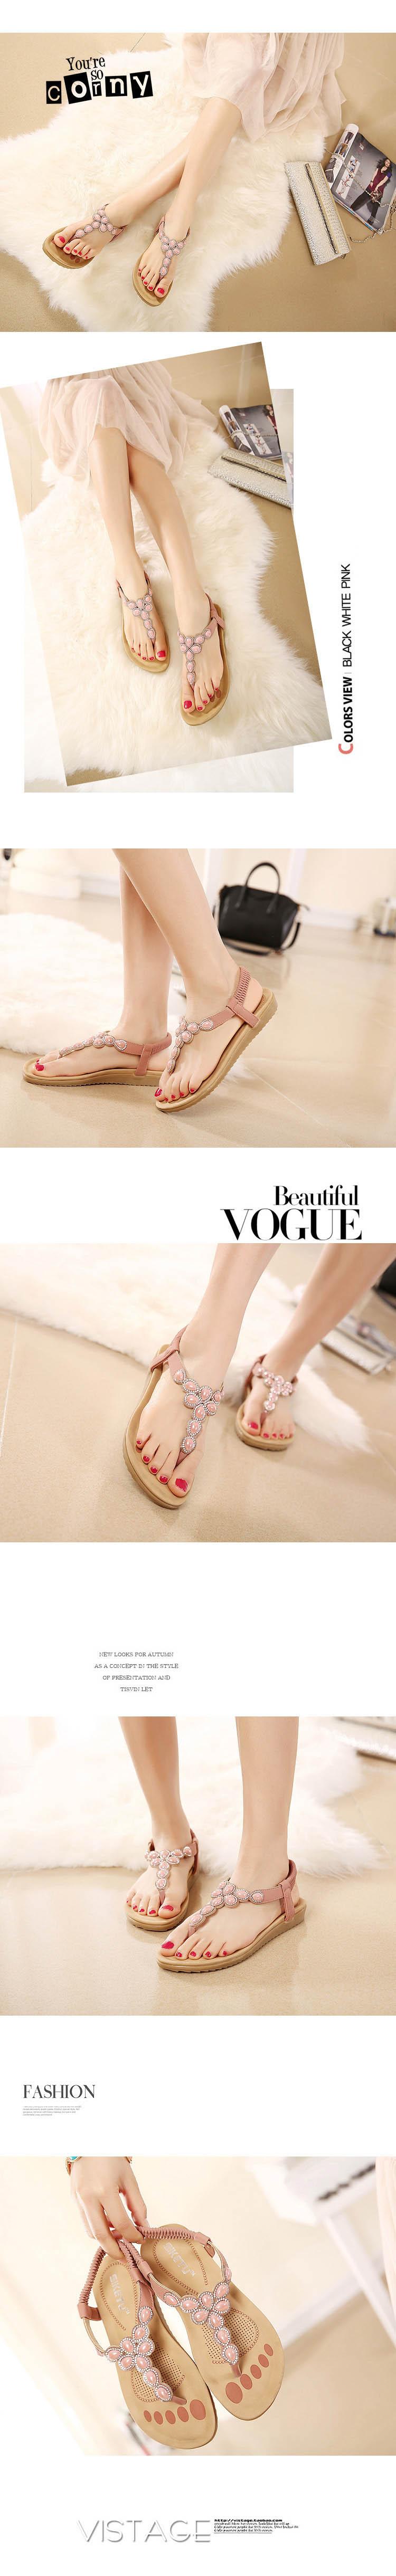 $15.50- SIKETU Charming Gladiator Sandals #omgnb #sandals #gladiator